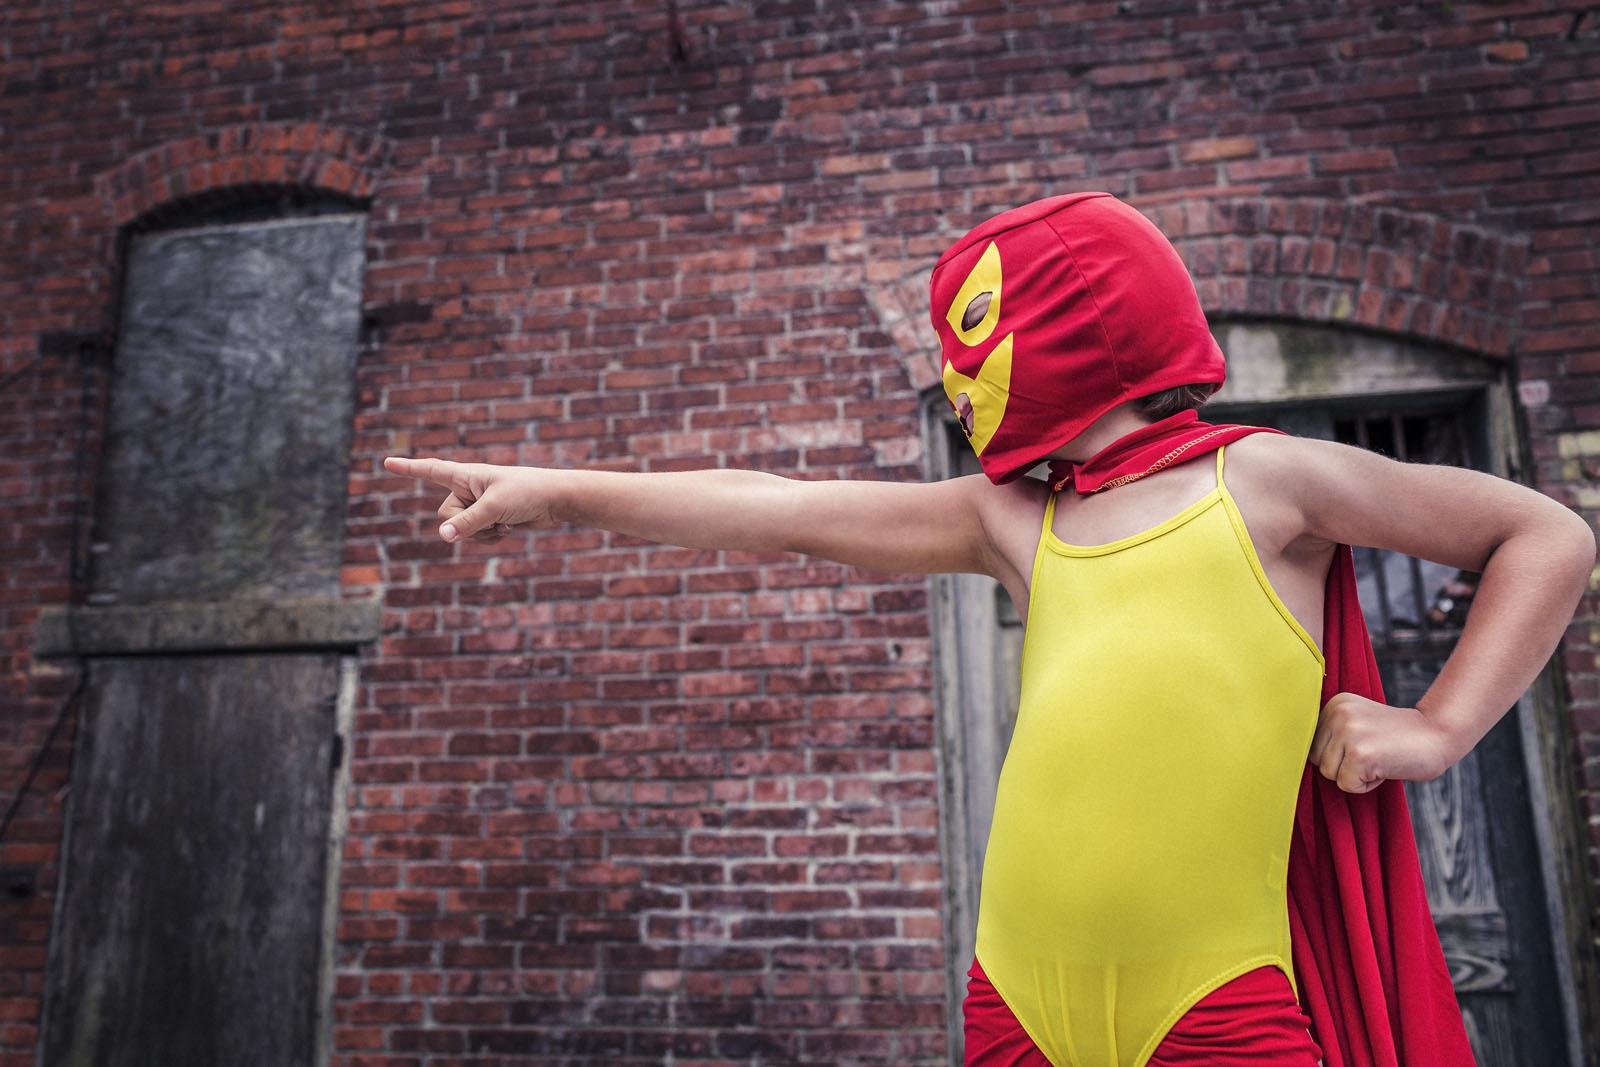 marketing superheros, boy dressed as masked hero